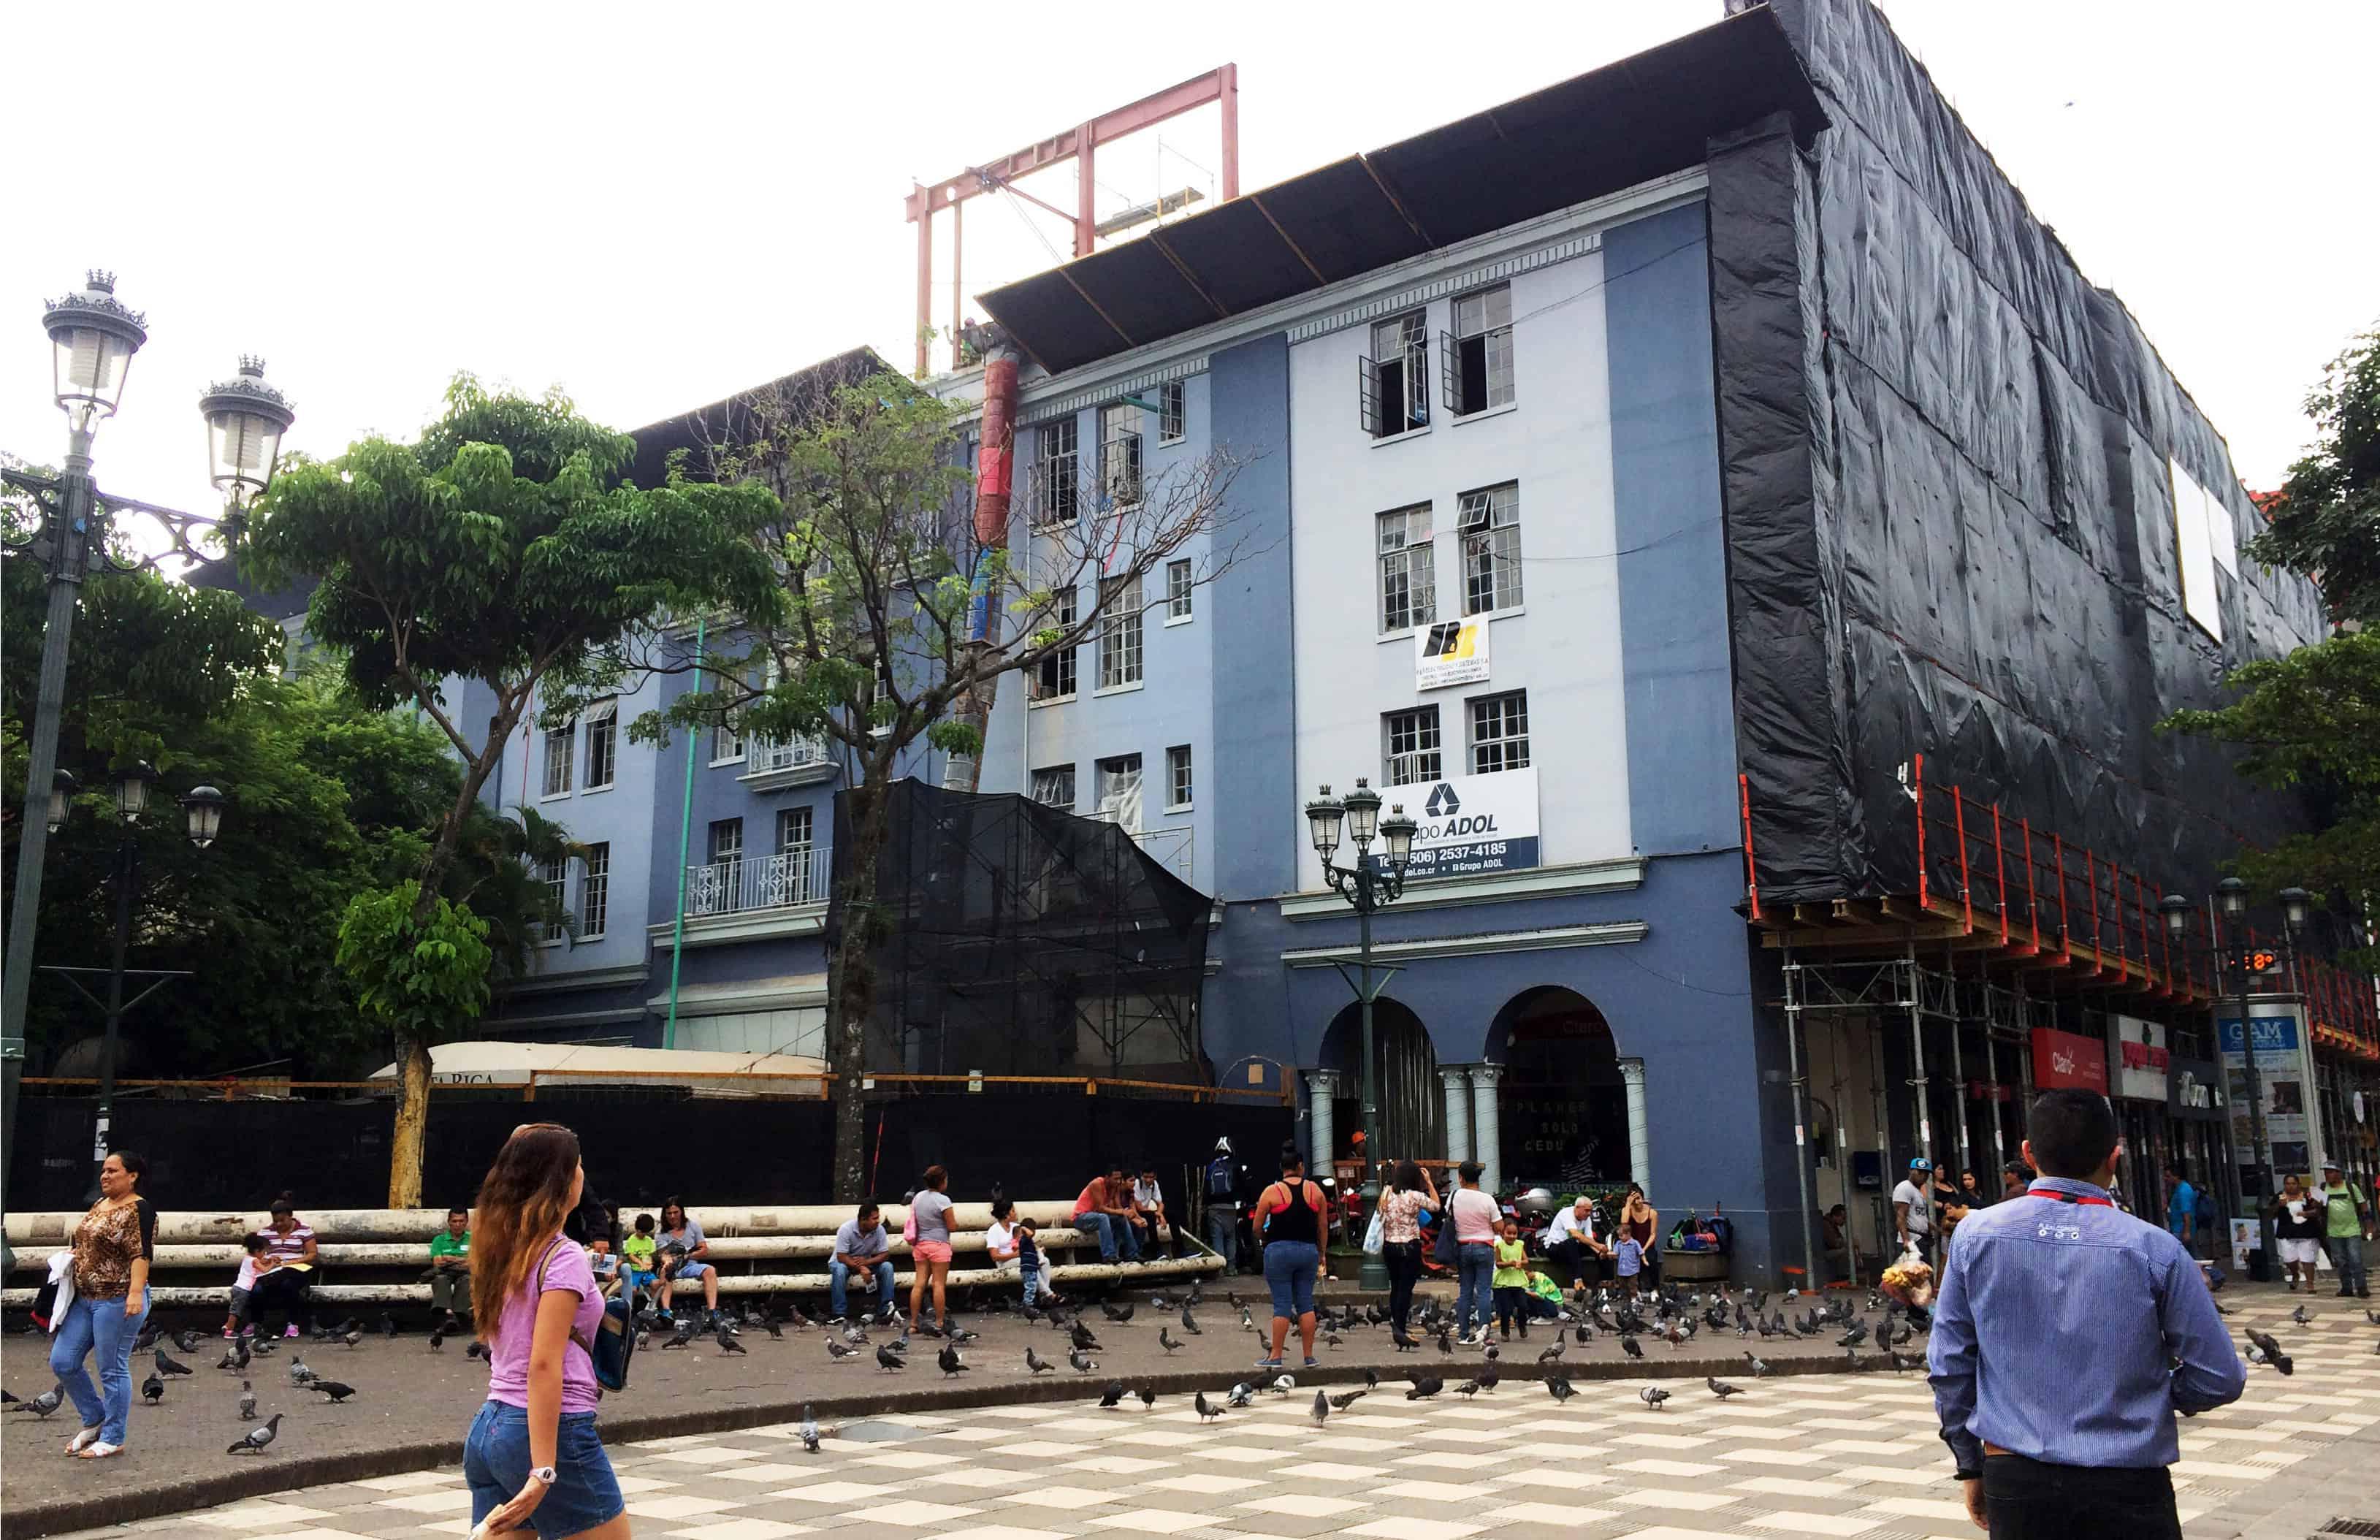 Renovation of Grand Hotel Costa Rica. June 7, 2017.